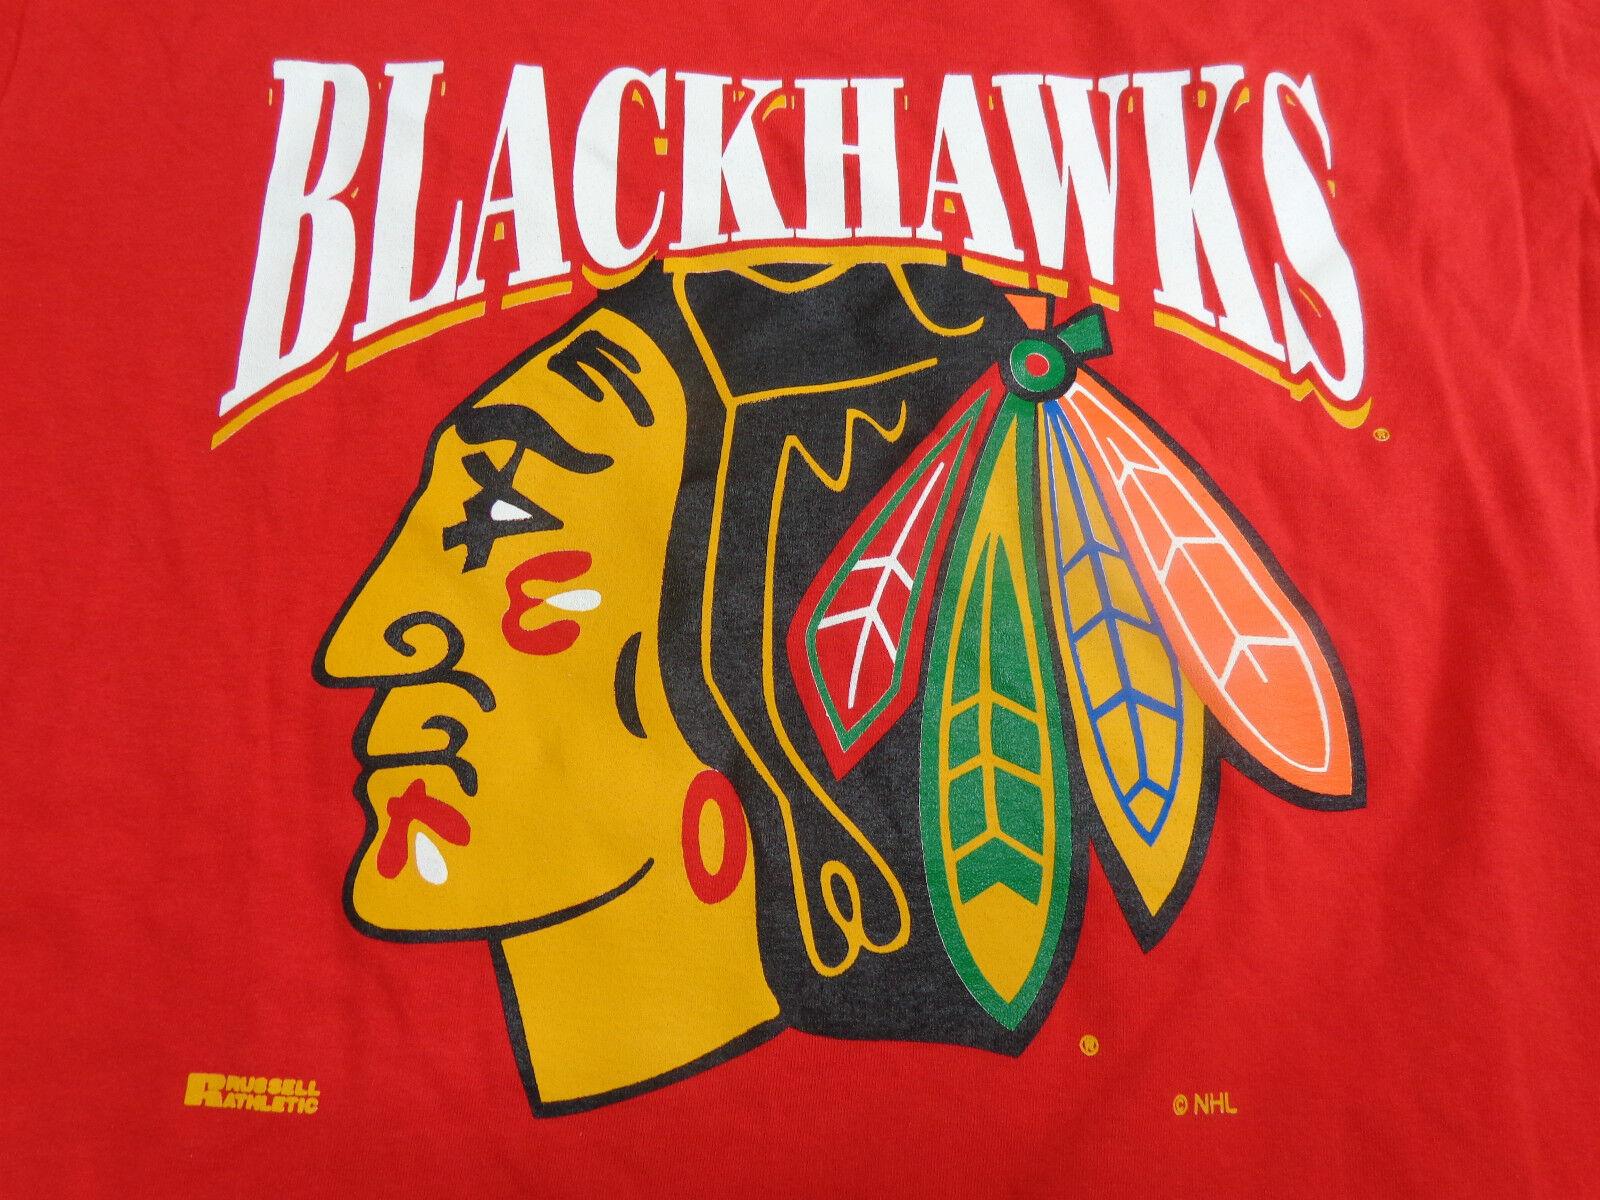 Vintage Blackhawks Shirt 67